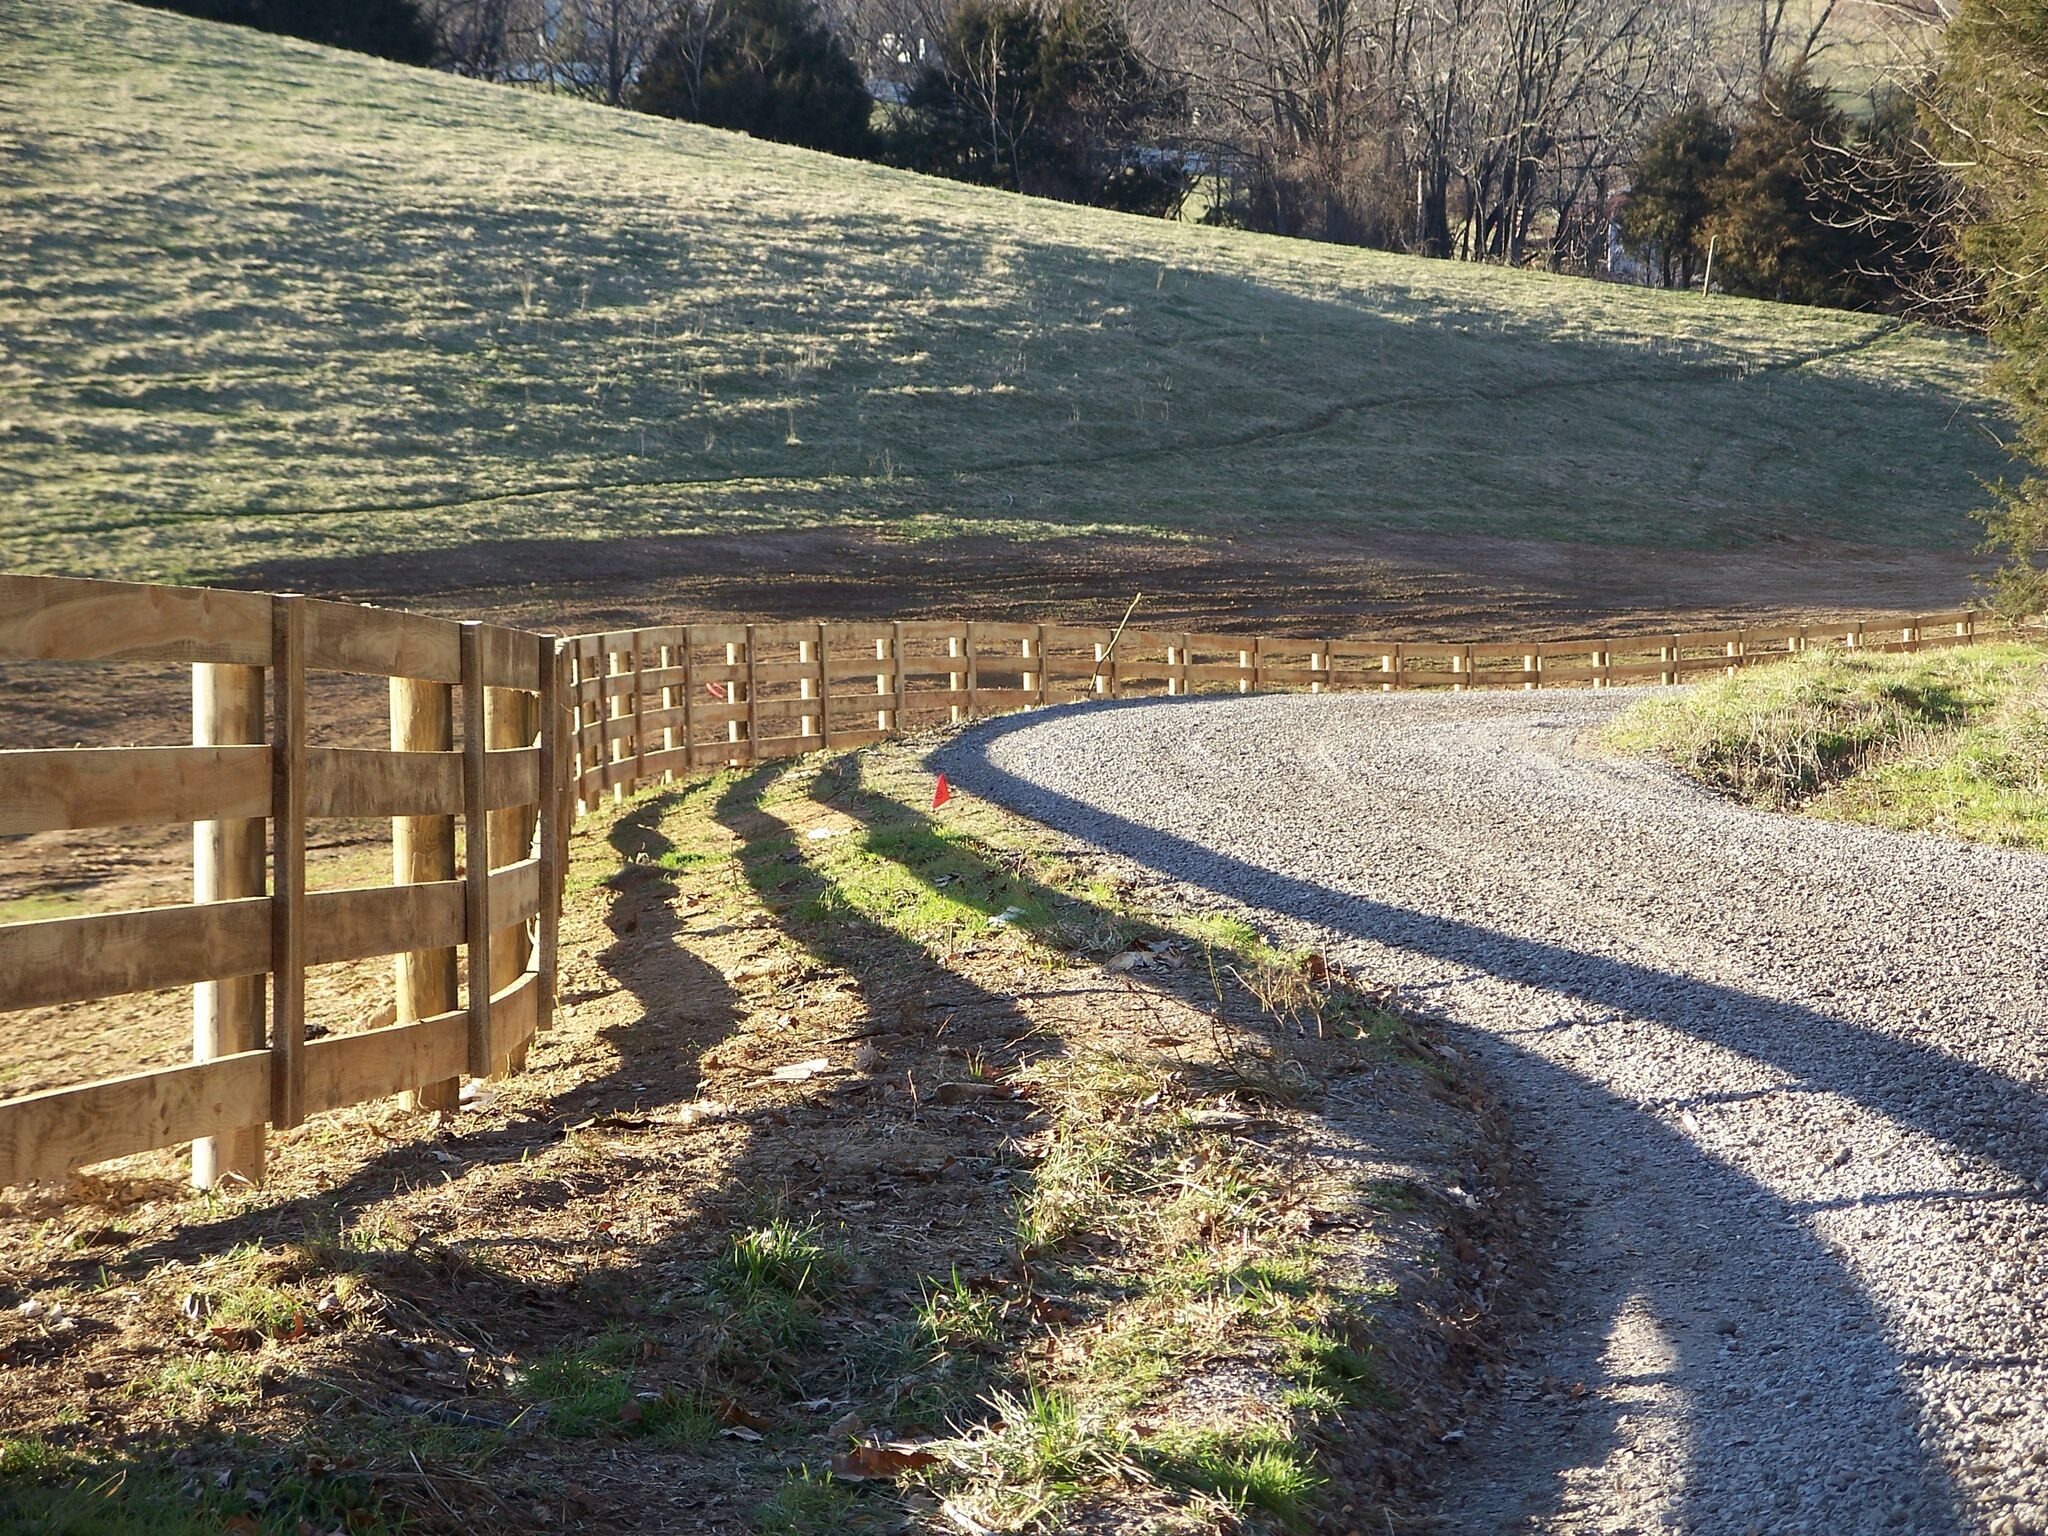 Farm Fence Installation for Culpeper, Virginia | ProFence